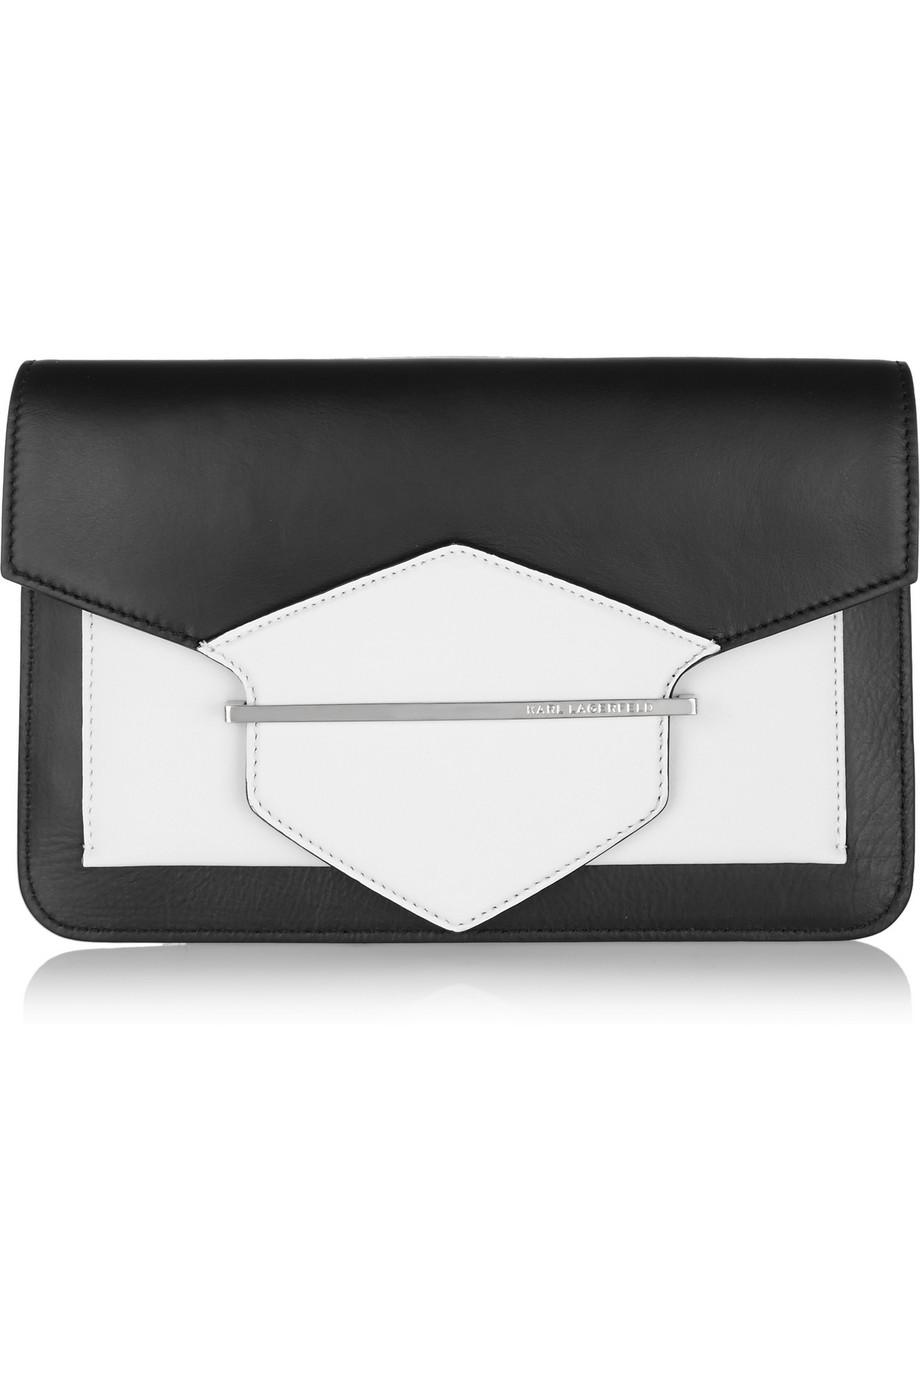 Karl Lagerfeld Khic LeatherClutch $425